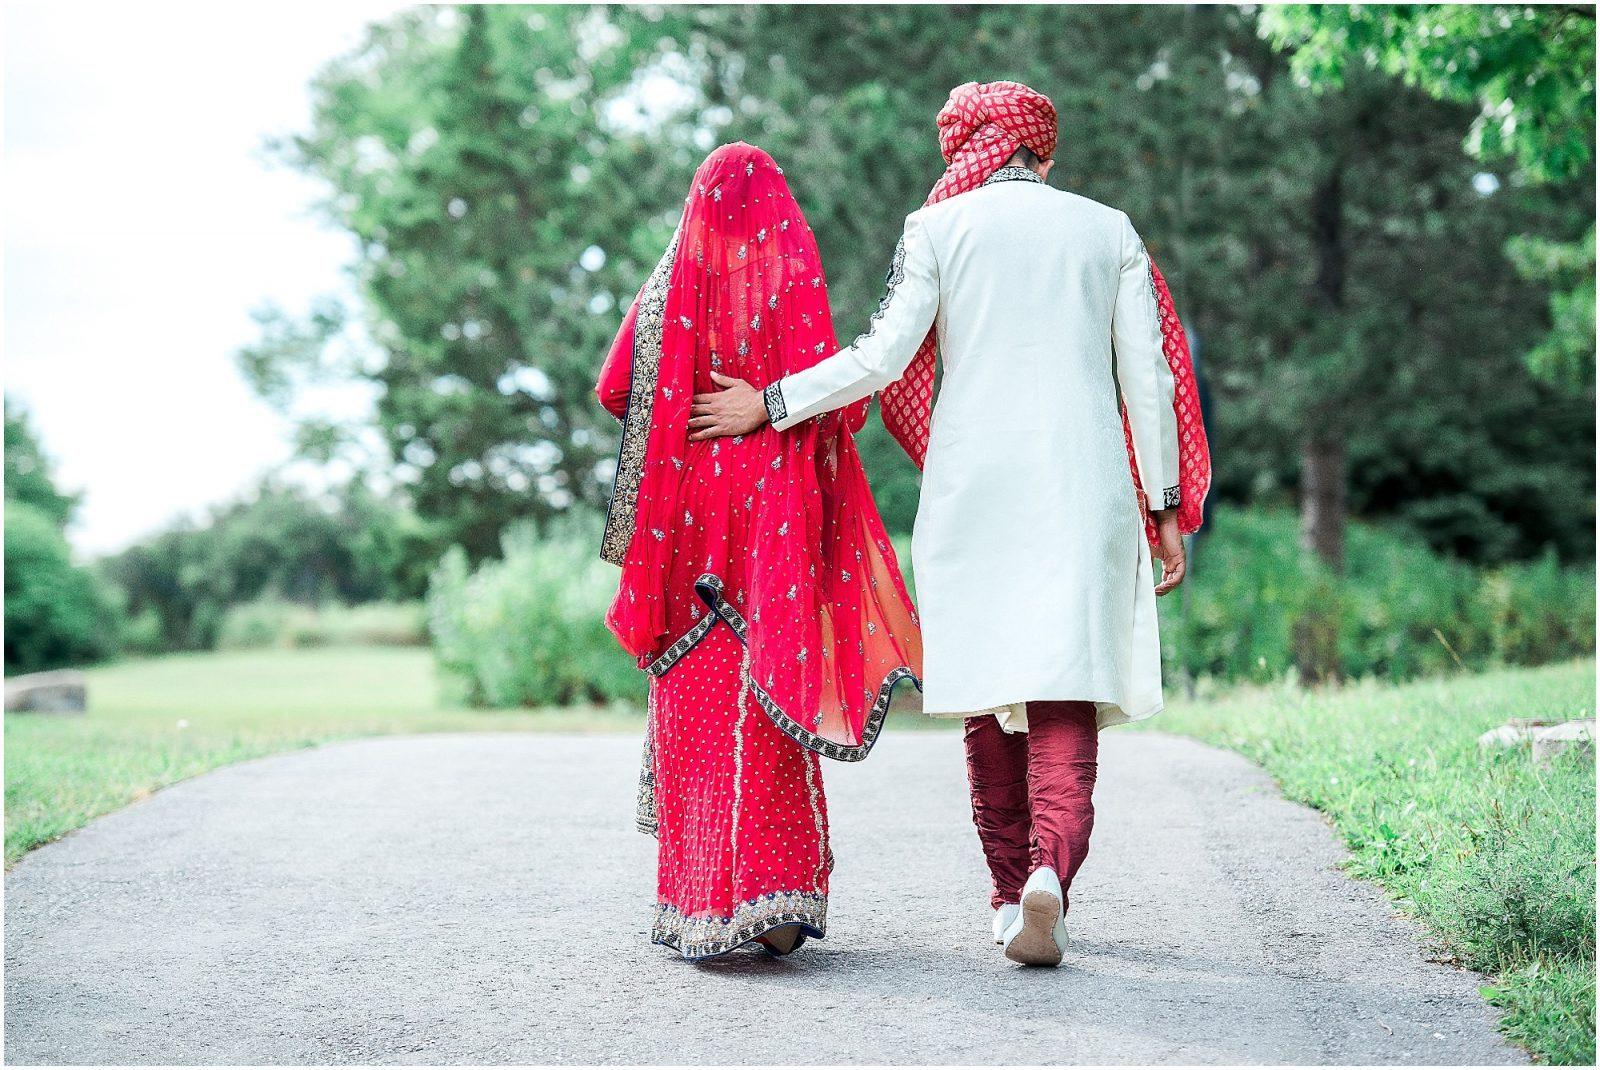 South Asian Wedding Toronto Photography - Mehndi, Nikah, walima, indian wedding, pakistani wedding. Sarah & Sajid - bride and groom walking away